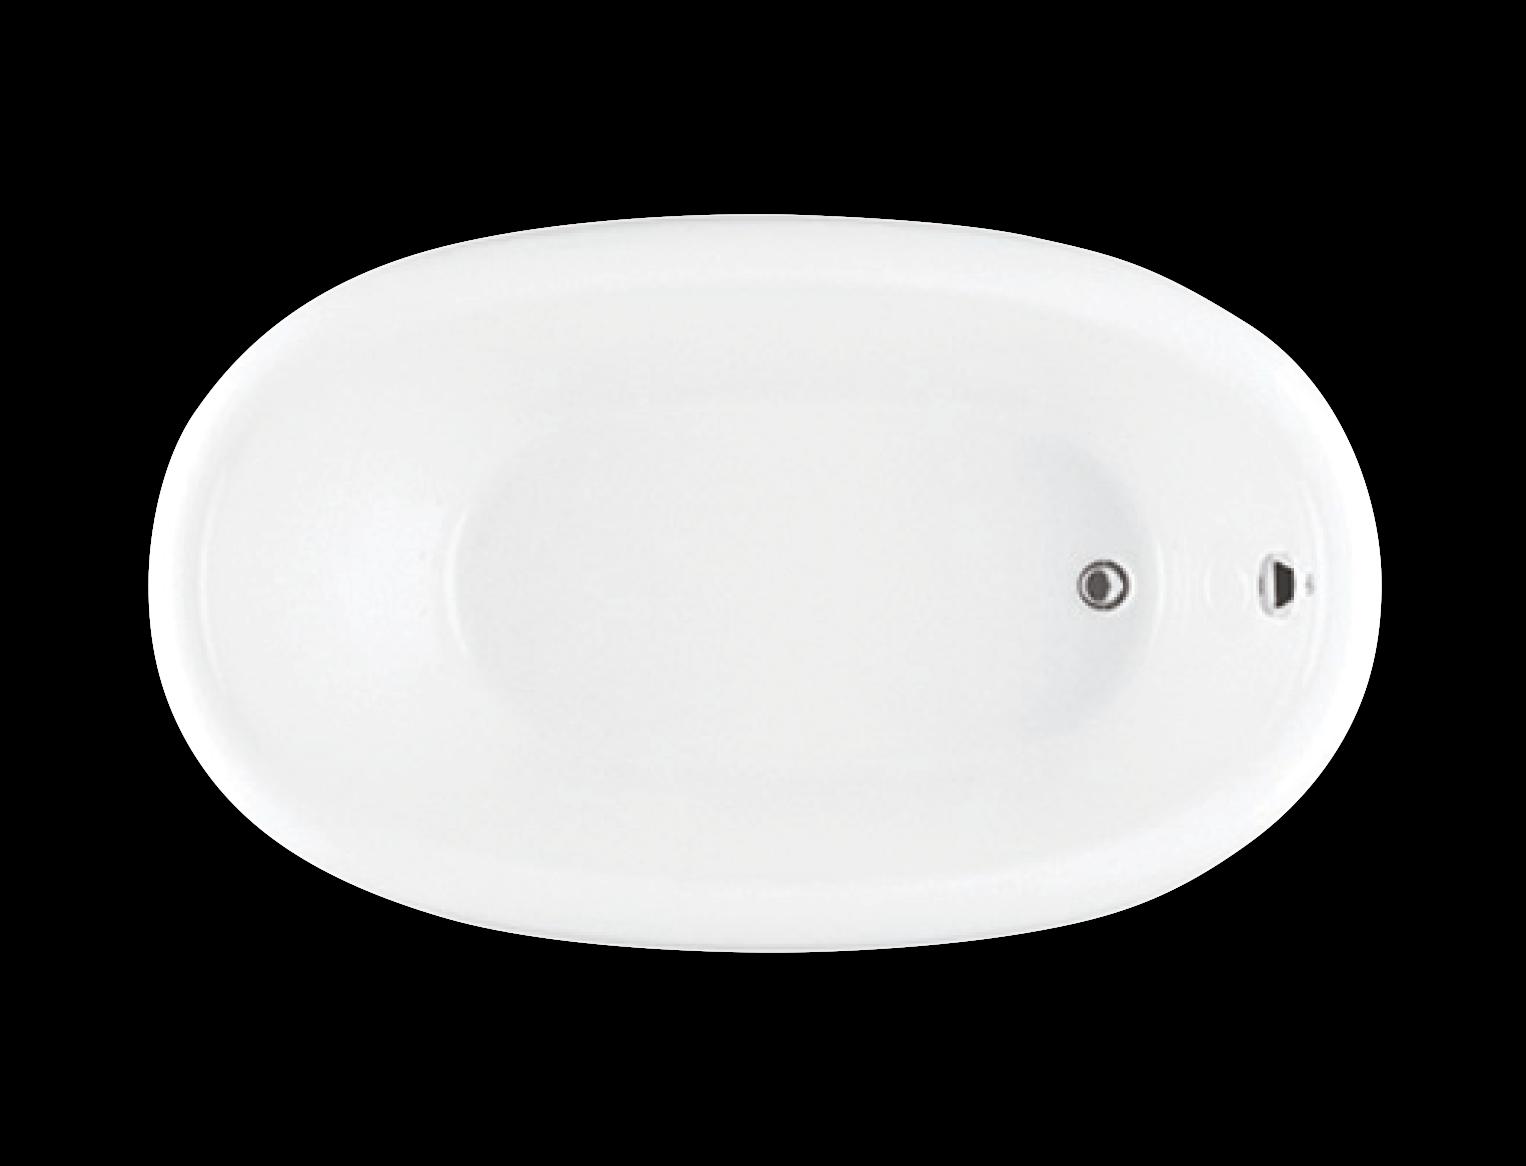 Bainultra Balneo® freestanding air jet bathtub for your modern bathroom